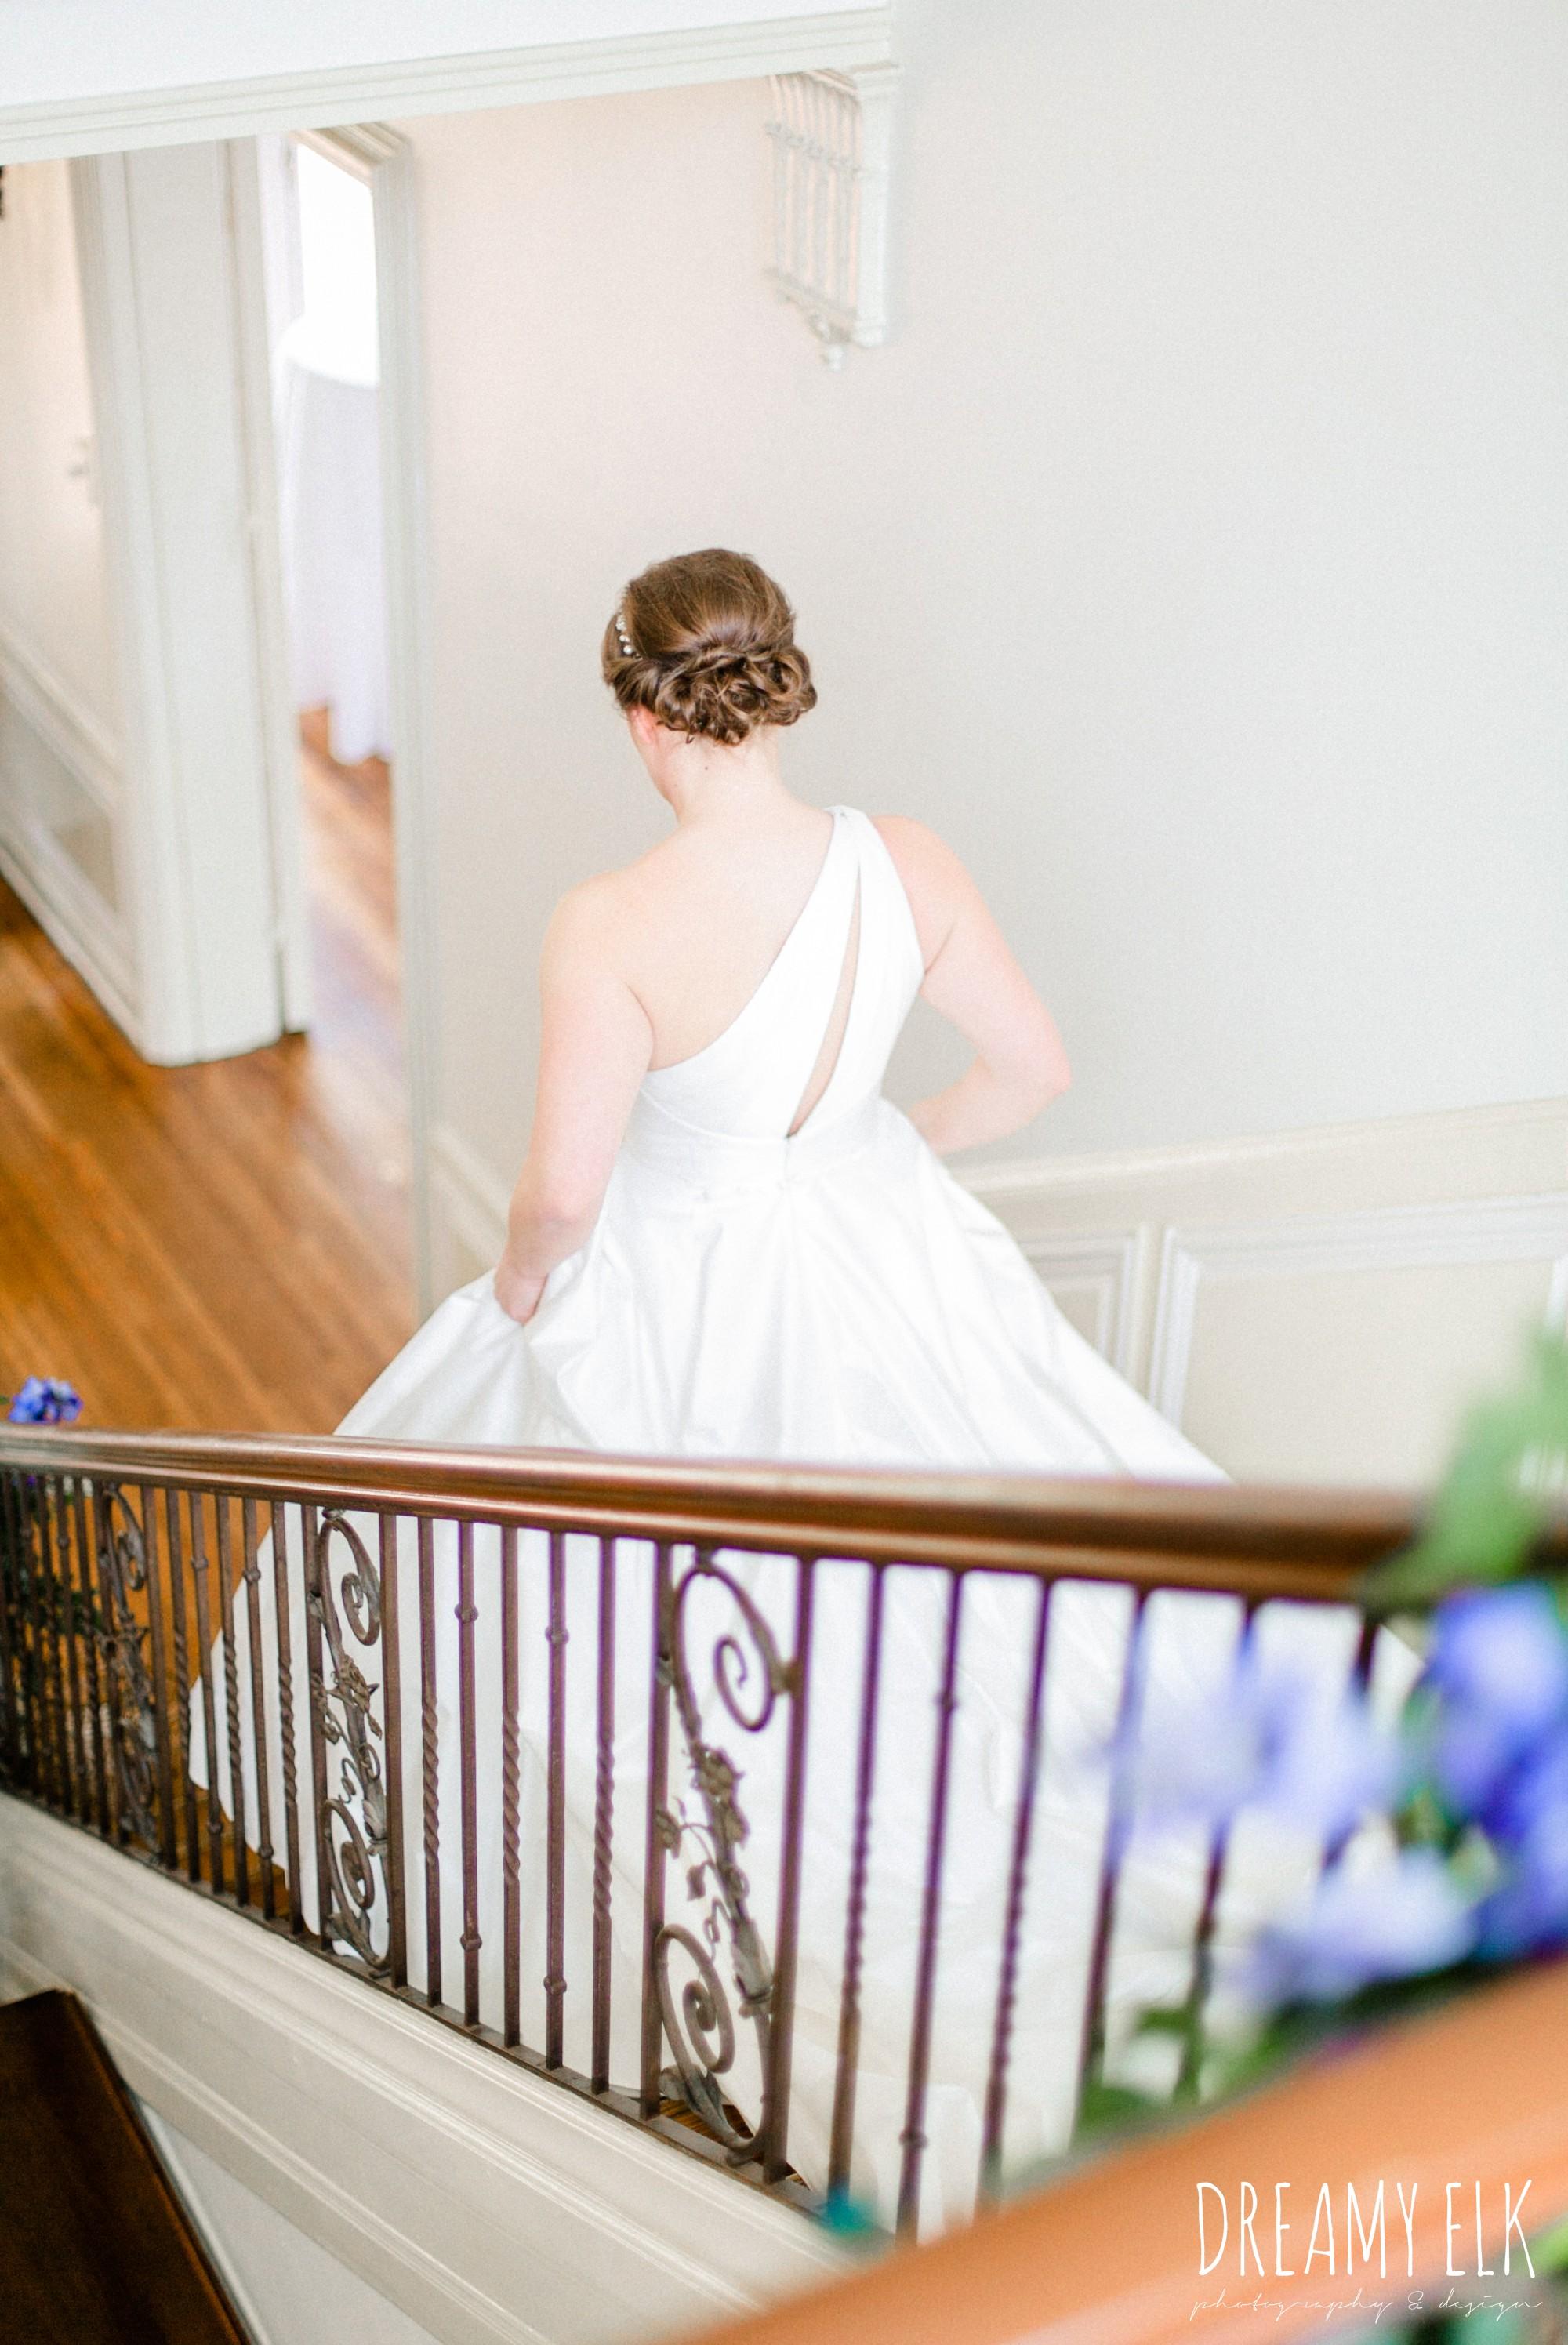 bride walking down the aisle, modern wedding dress ballgown, wedding hair updo, spring wedding, the astin mansion, bryan, texas, spring wedding, dreamy elk photography and design